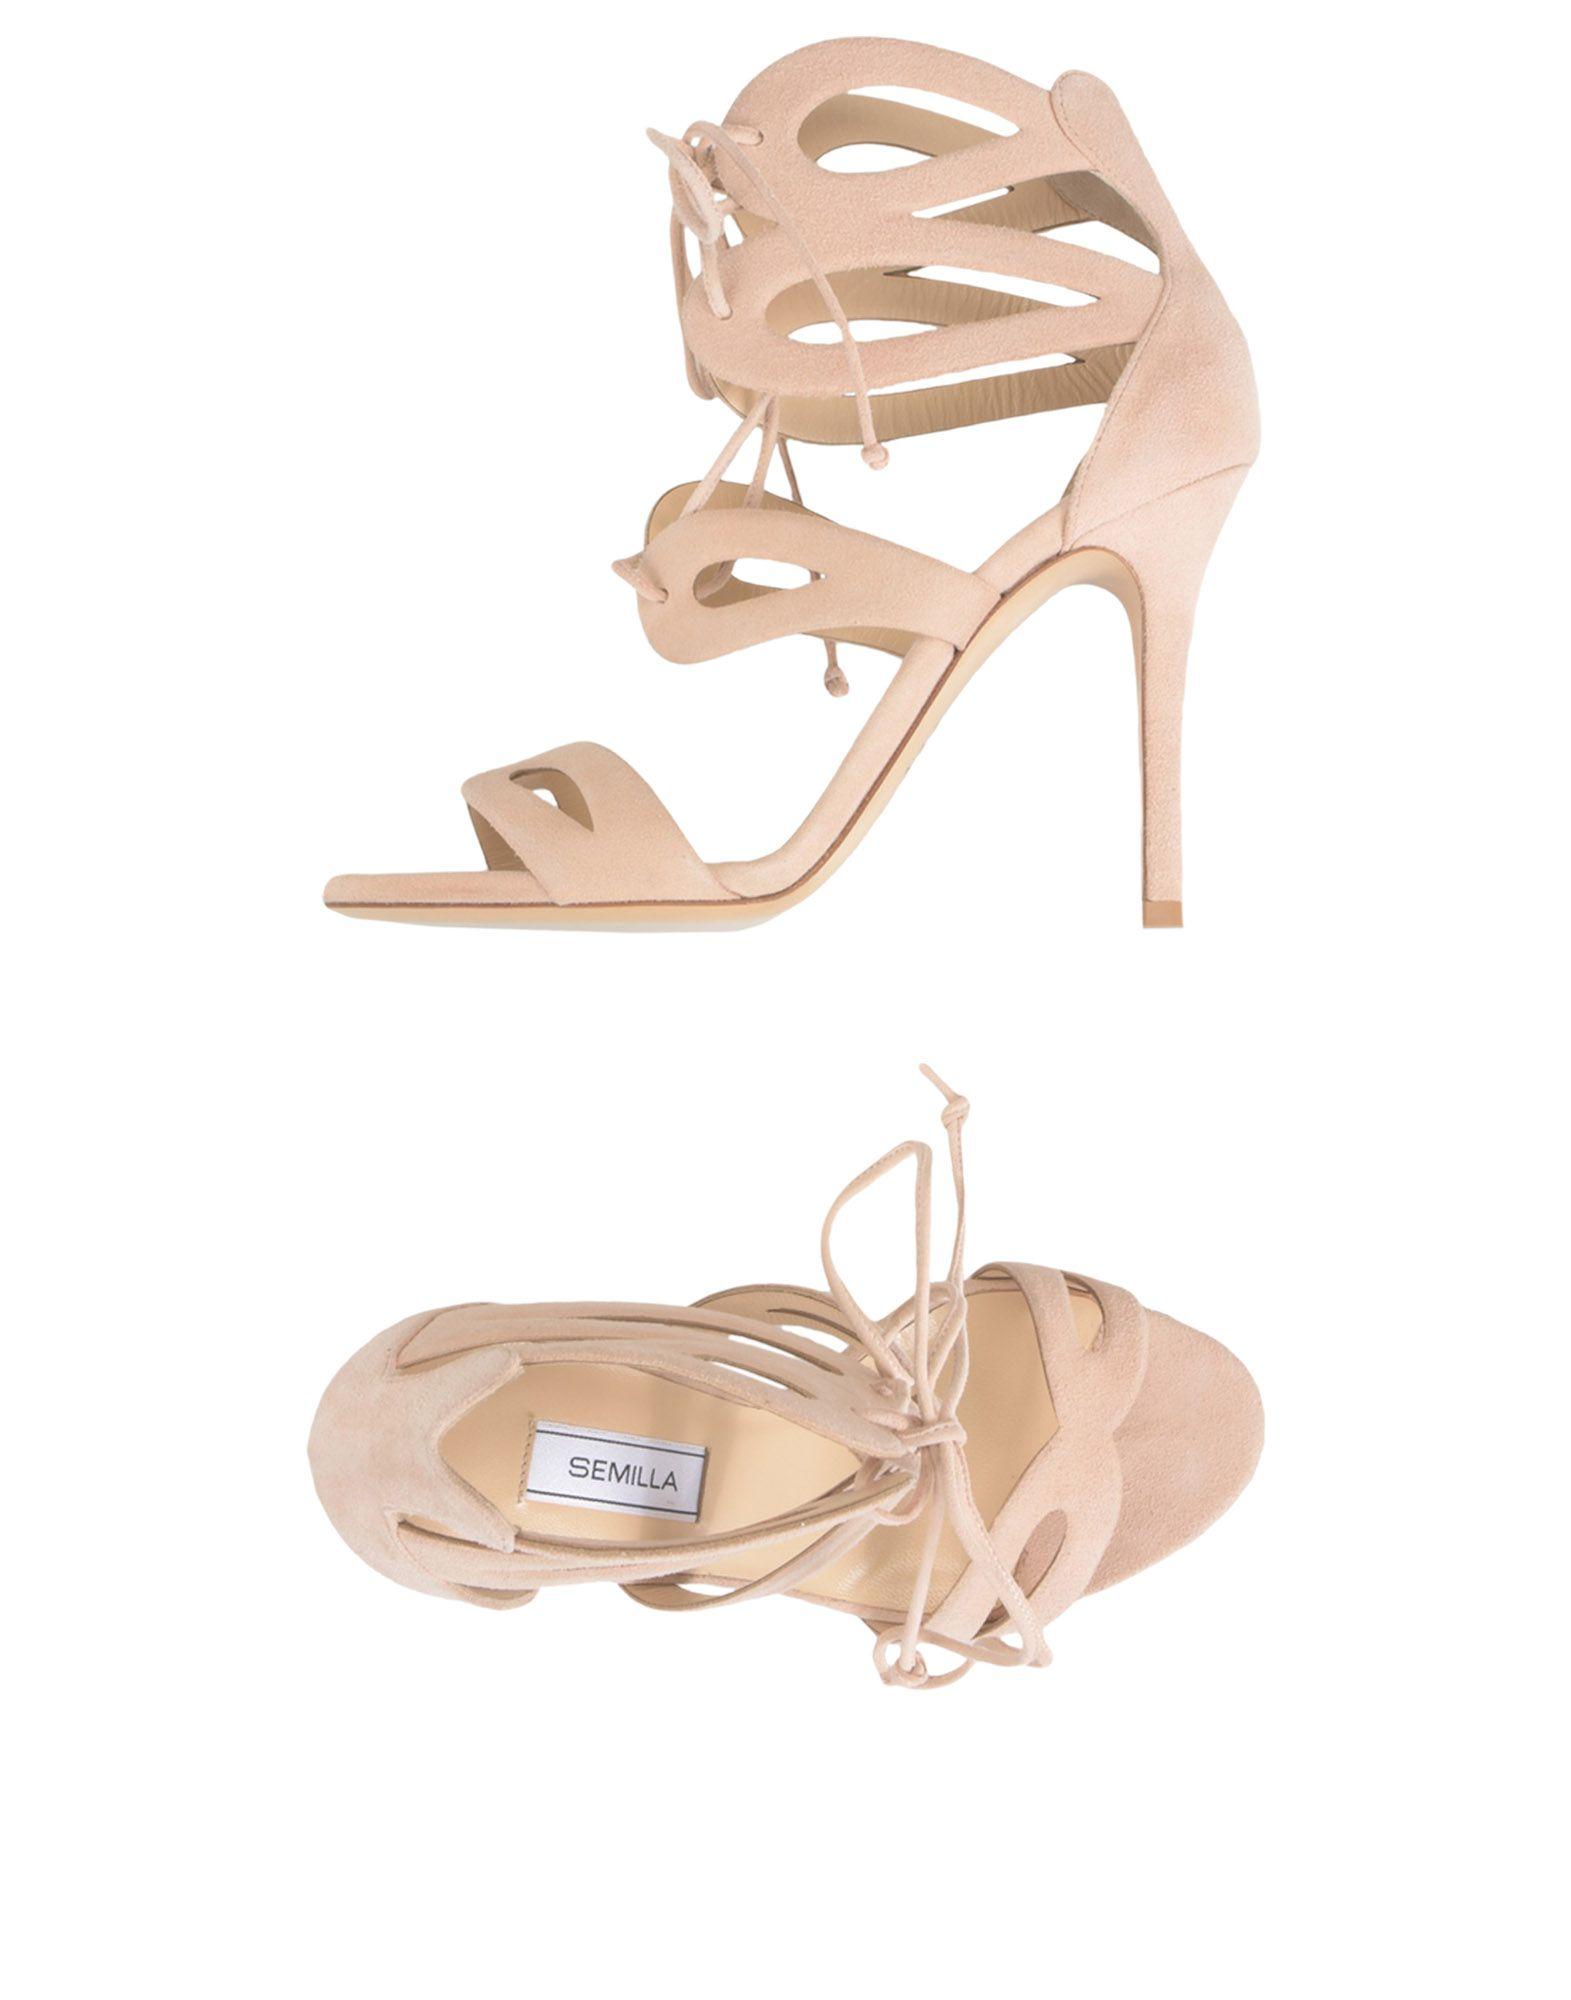 Haltbare Mode billige Schuhe Semilla Sandalen Damen  11160203DP Heiße Schuhe